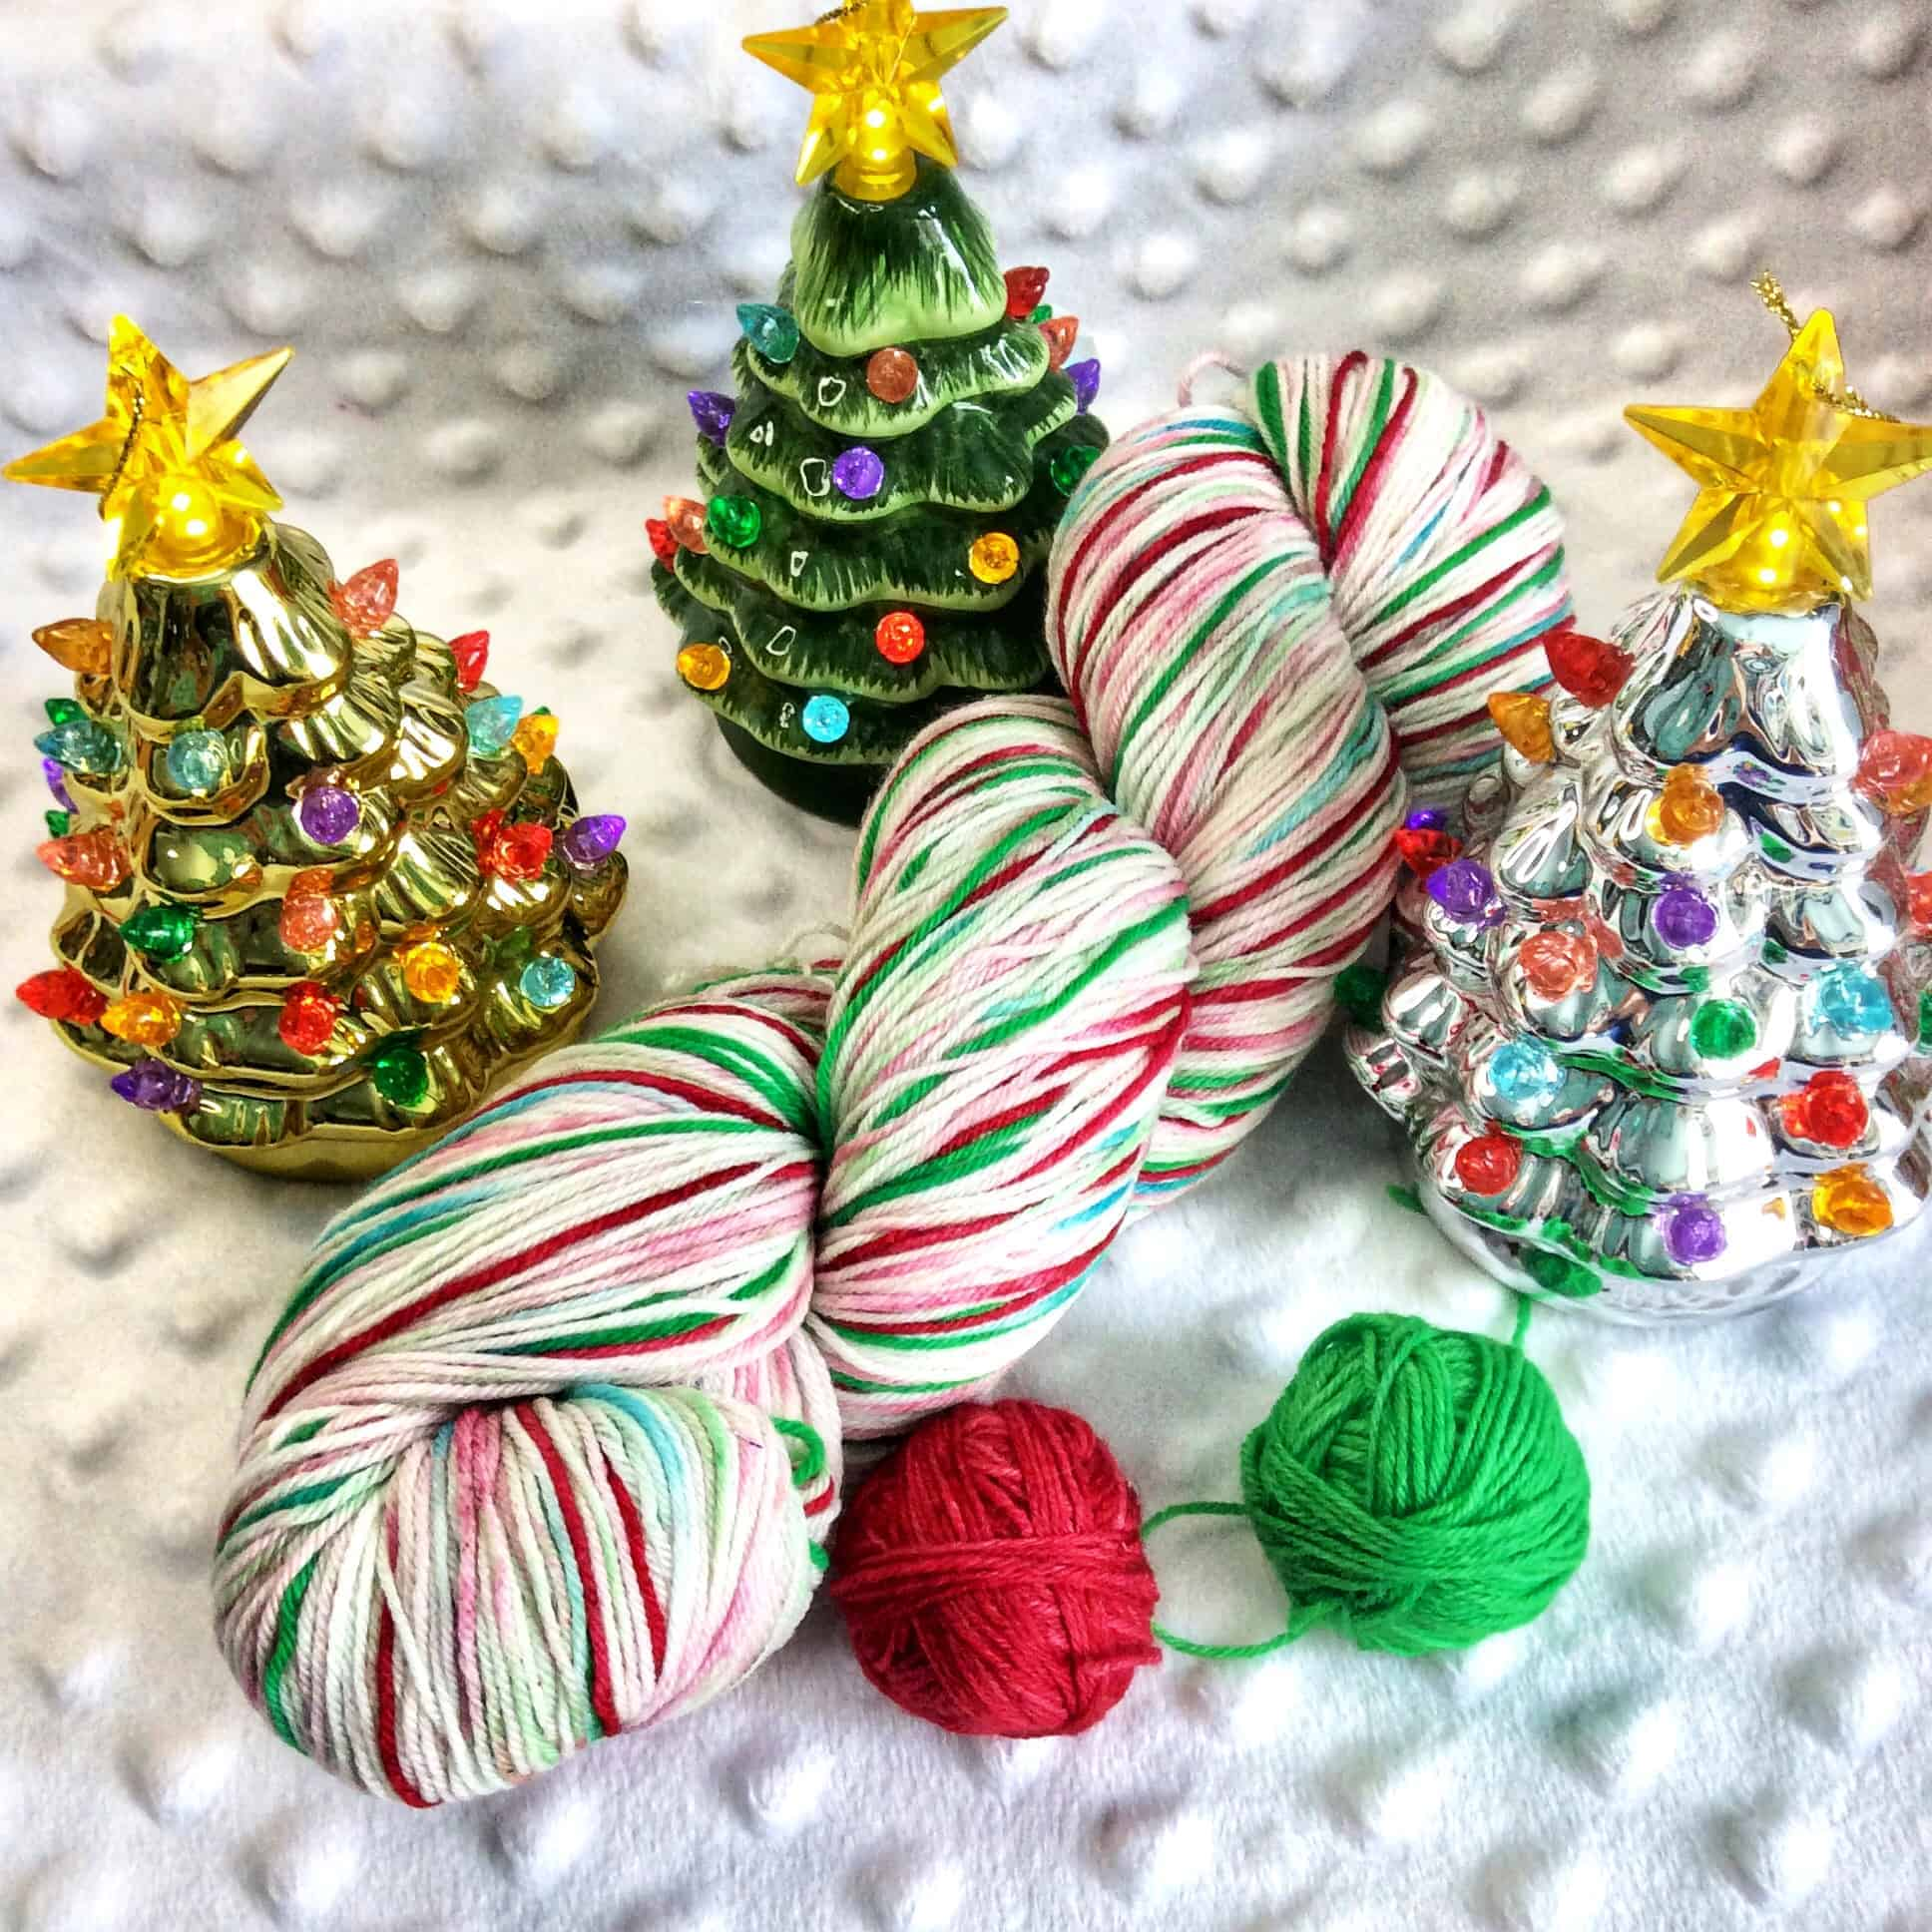 Christmas yarn.